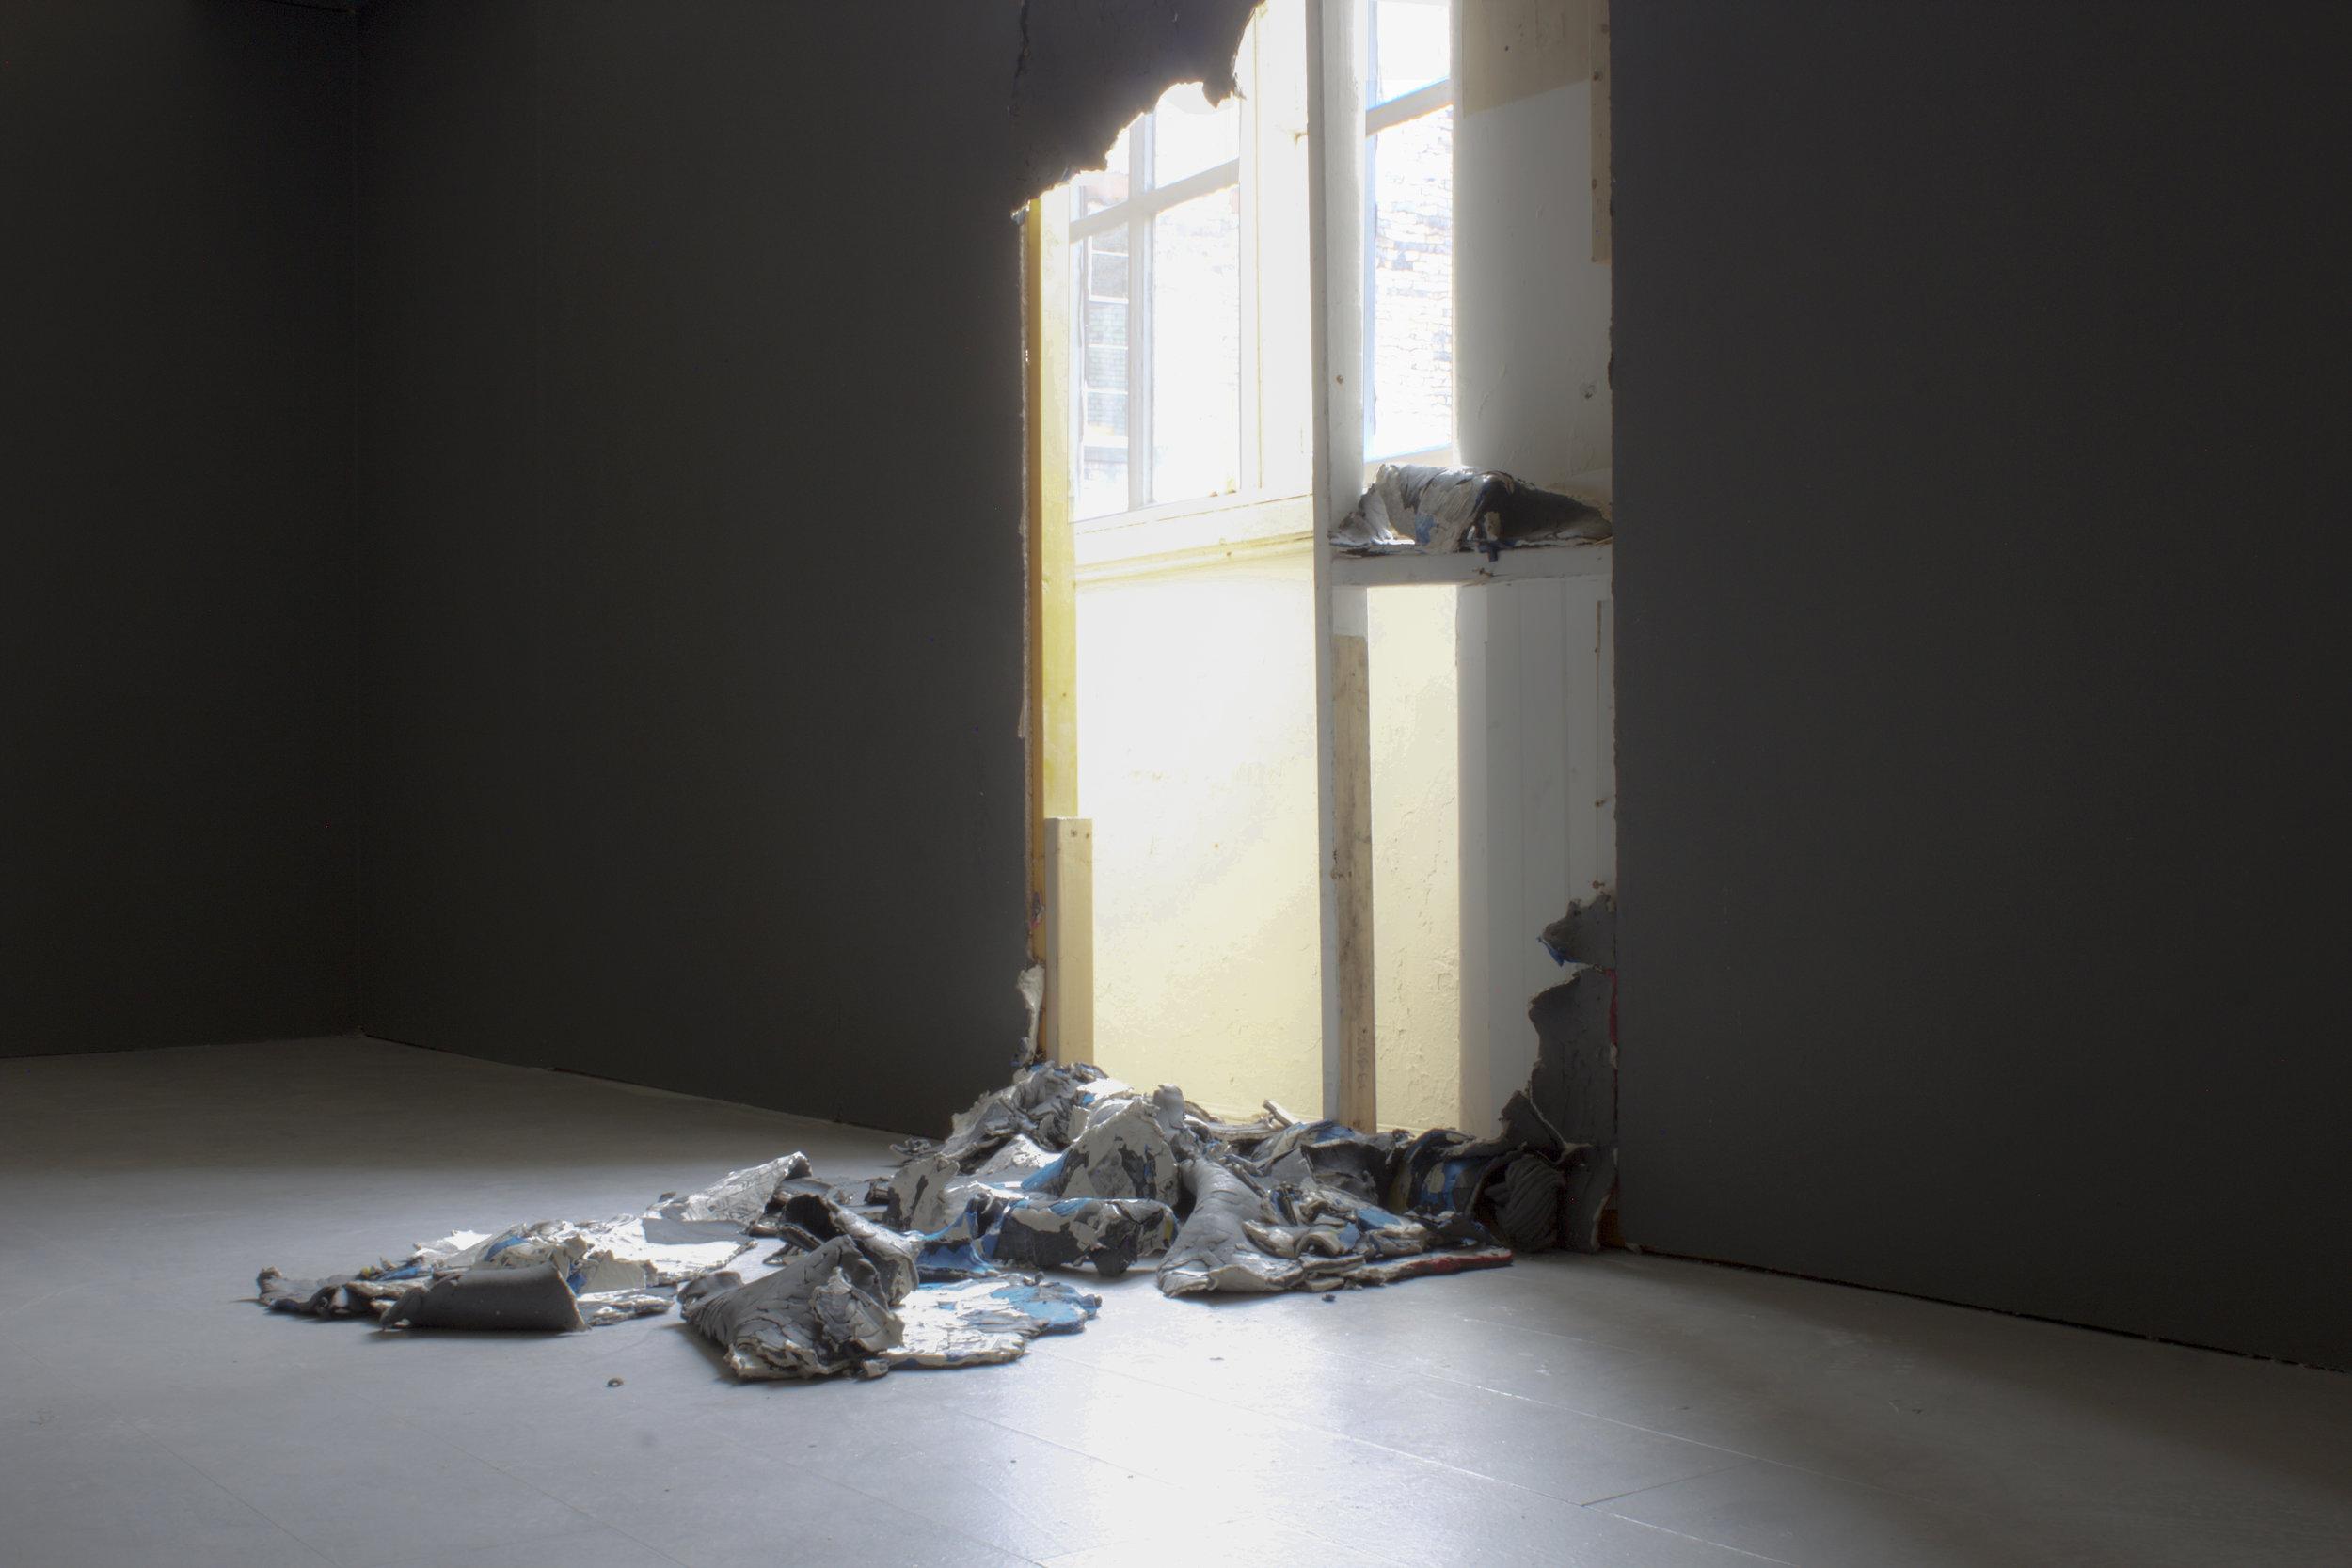 Rodrigo Red Sandoval, Rodrigo red,  contemporary art The wight of things.jpg